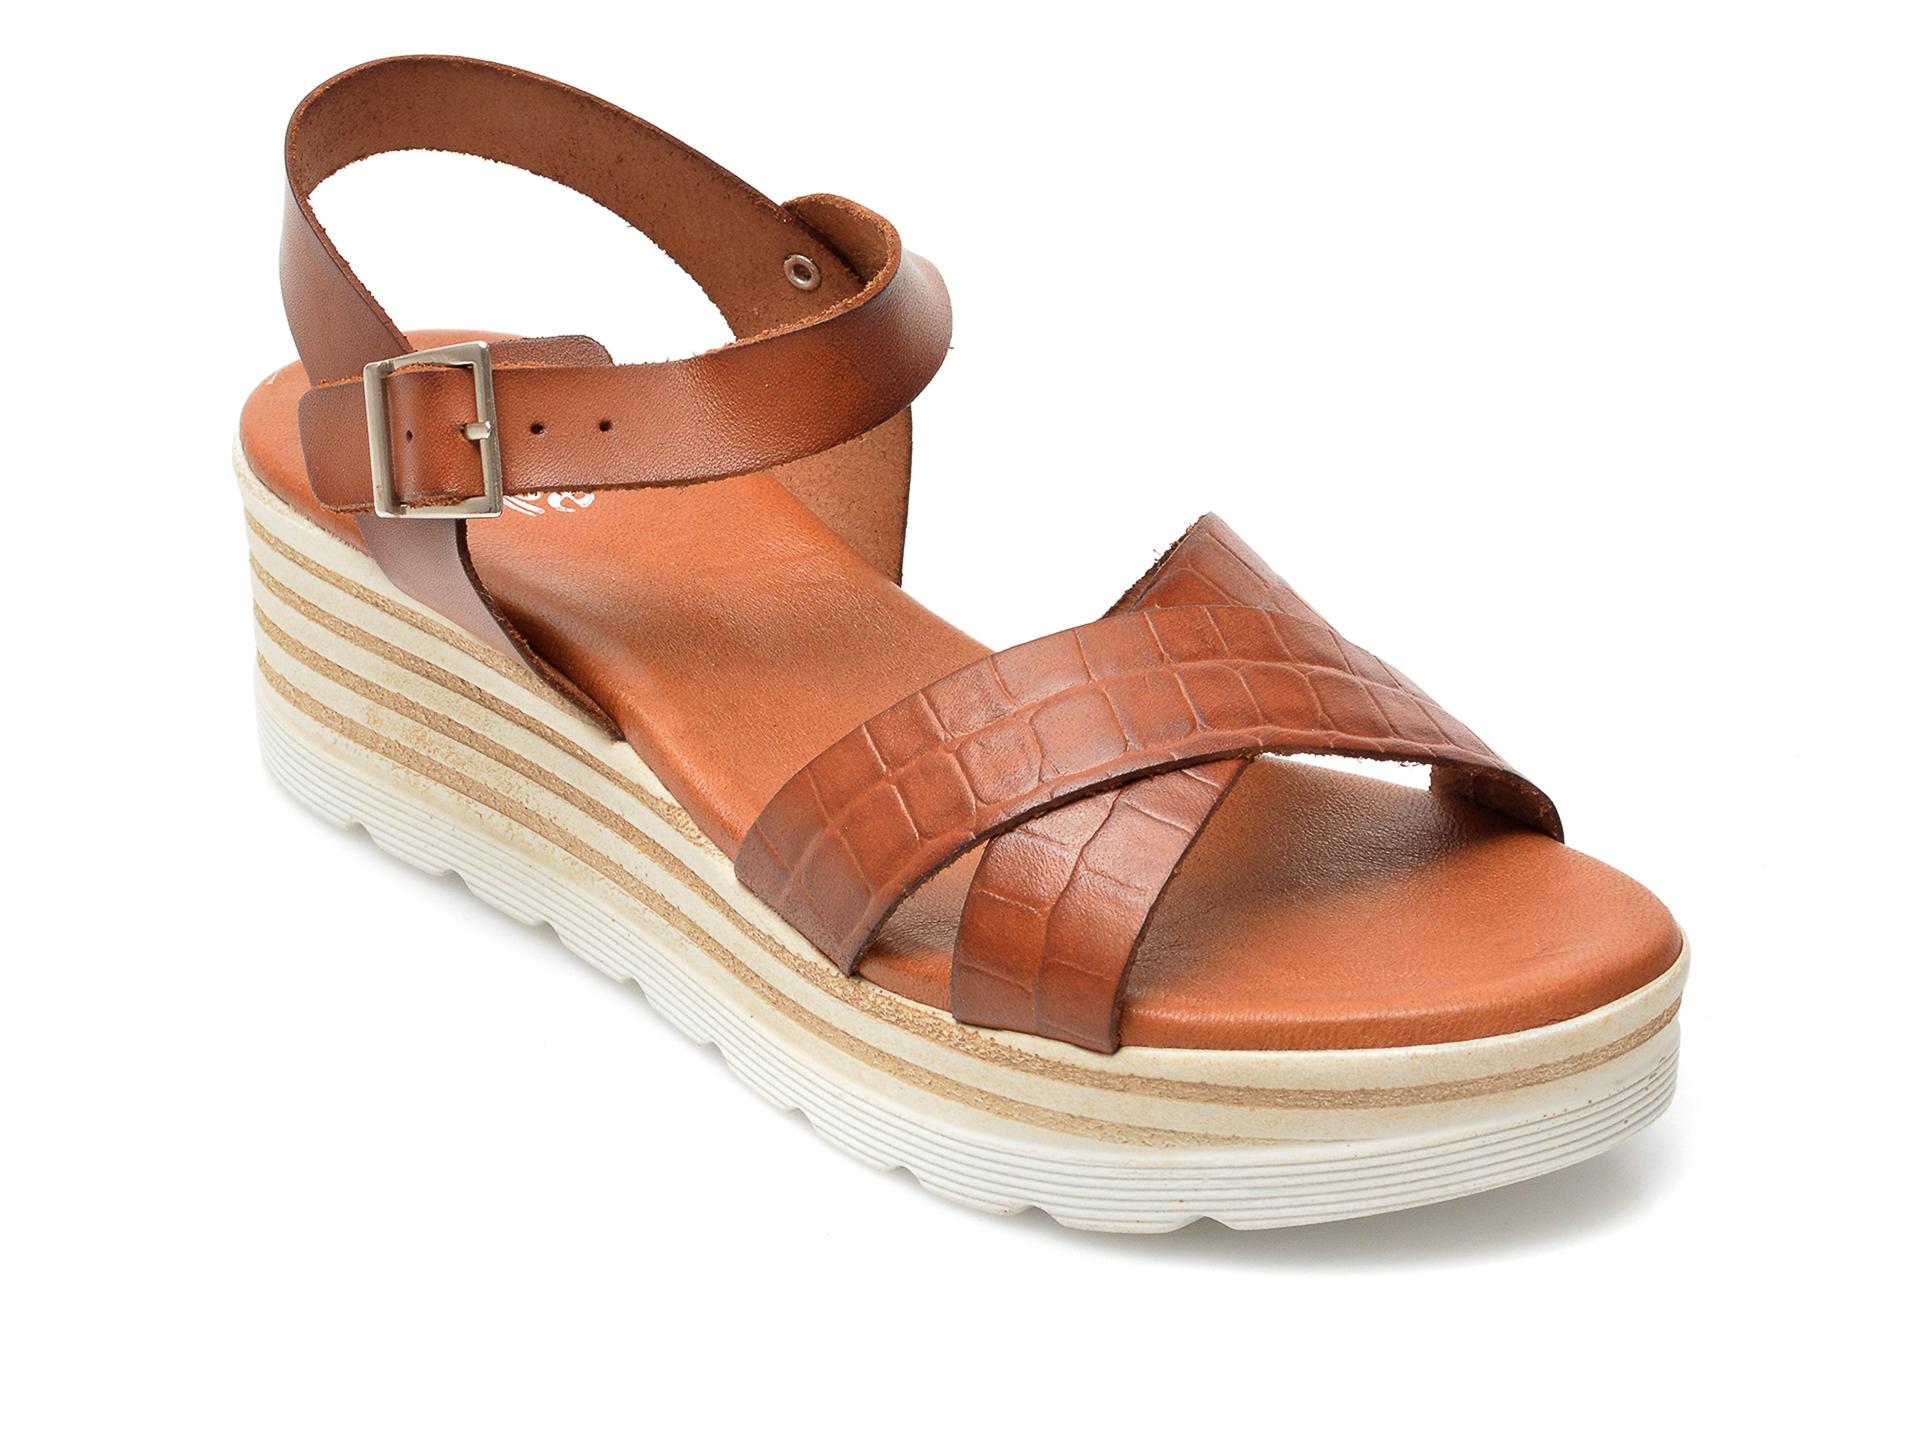 Sandale IMAGE maro inchis, 8110S, din piele naturala imagine otter.ro